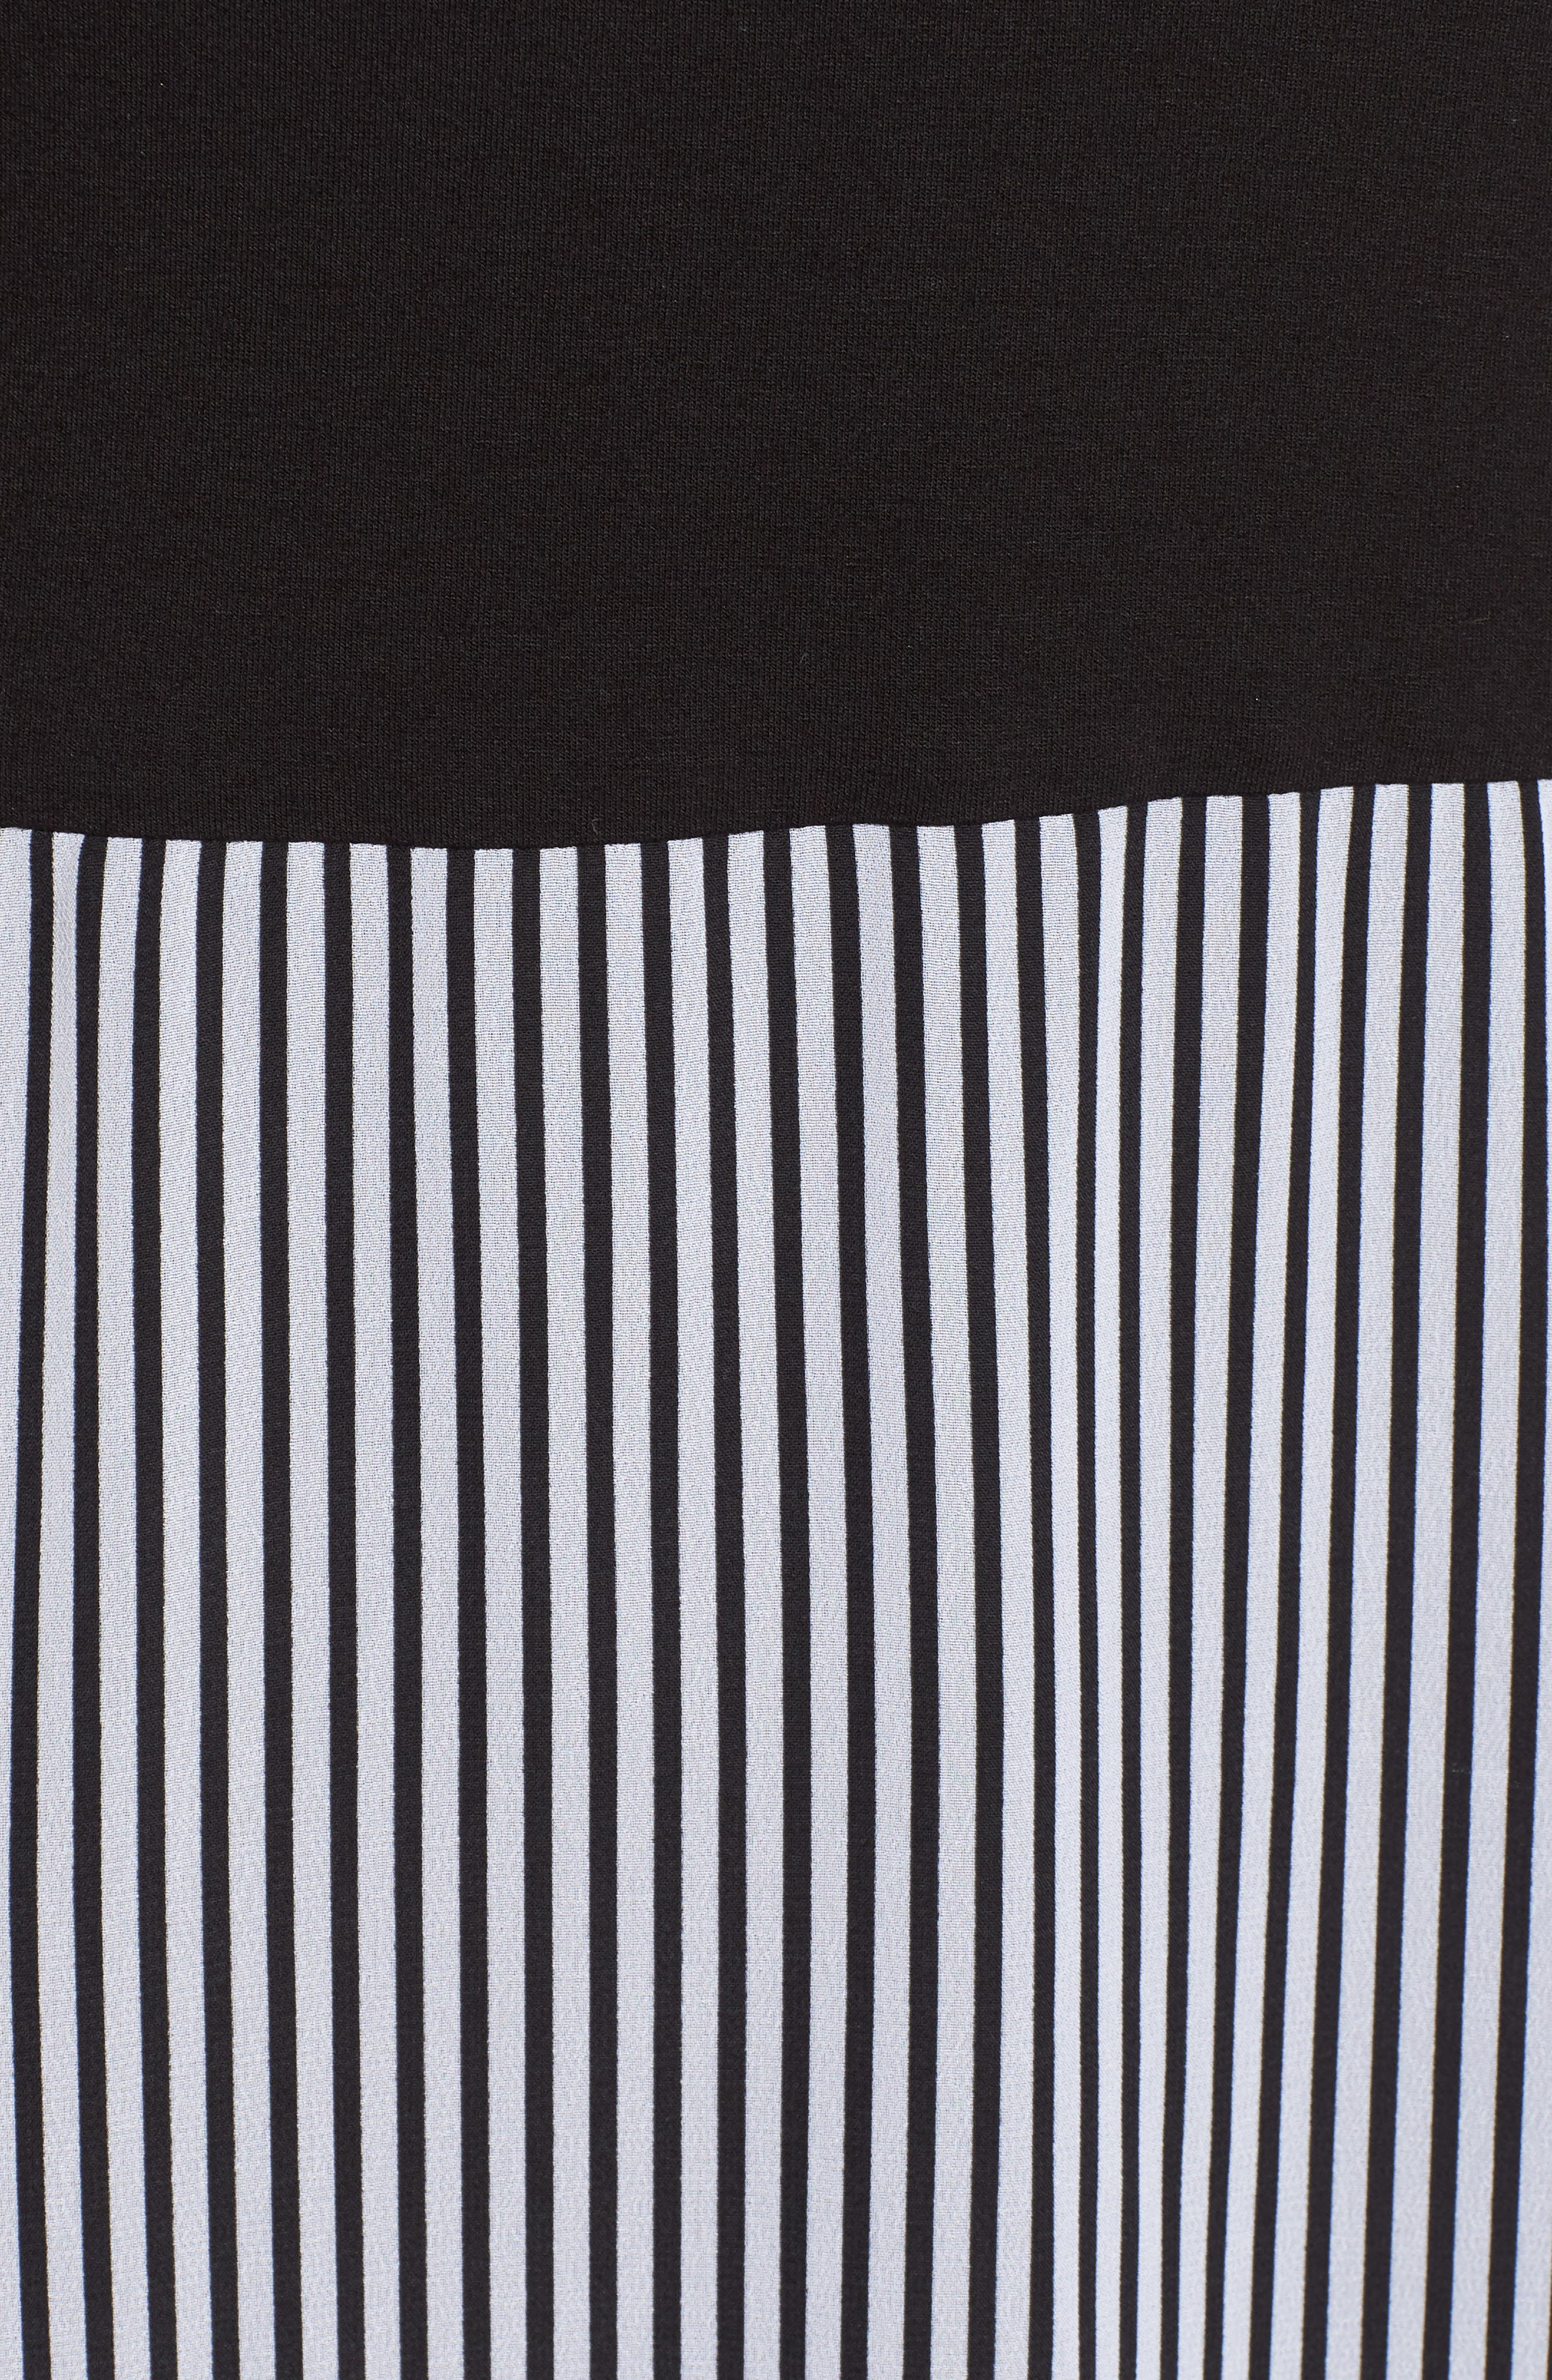 Stripe Chiffon Overlay Maxi Dress,                             Alternate thumbnail 6, color,                             RICH BLACK